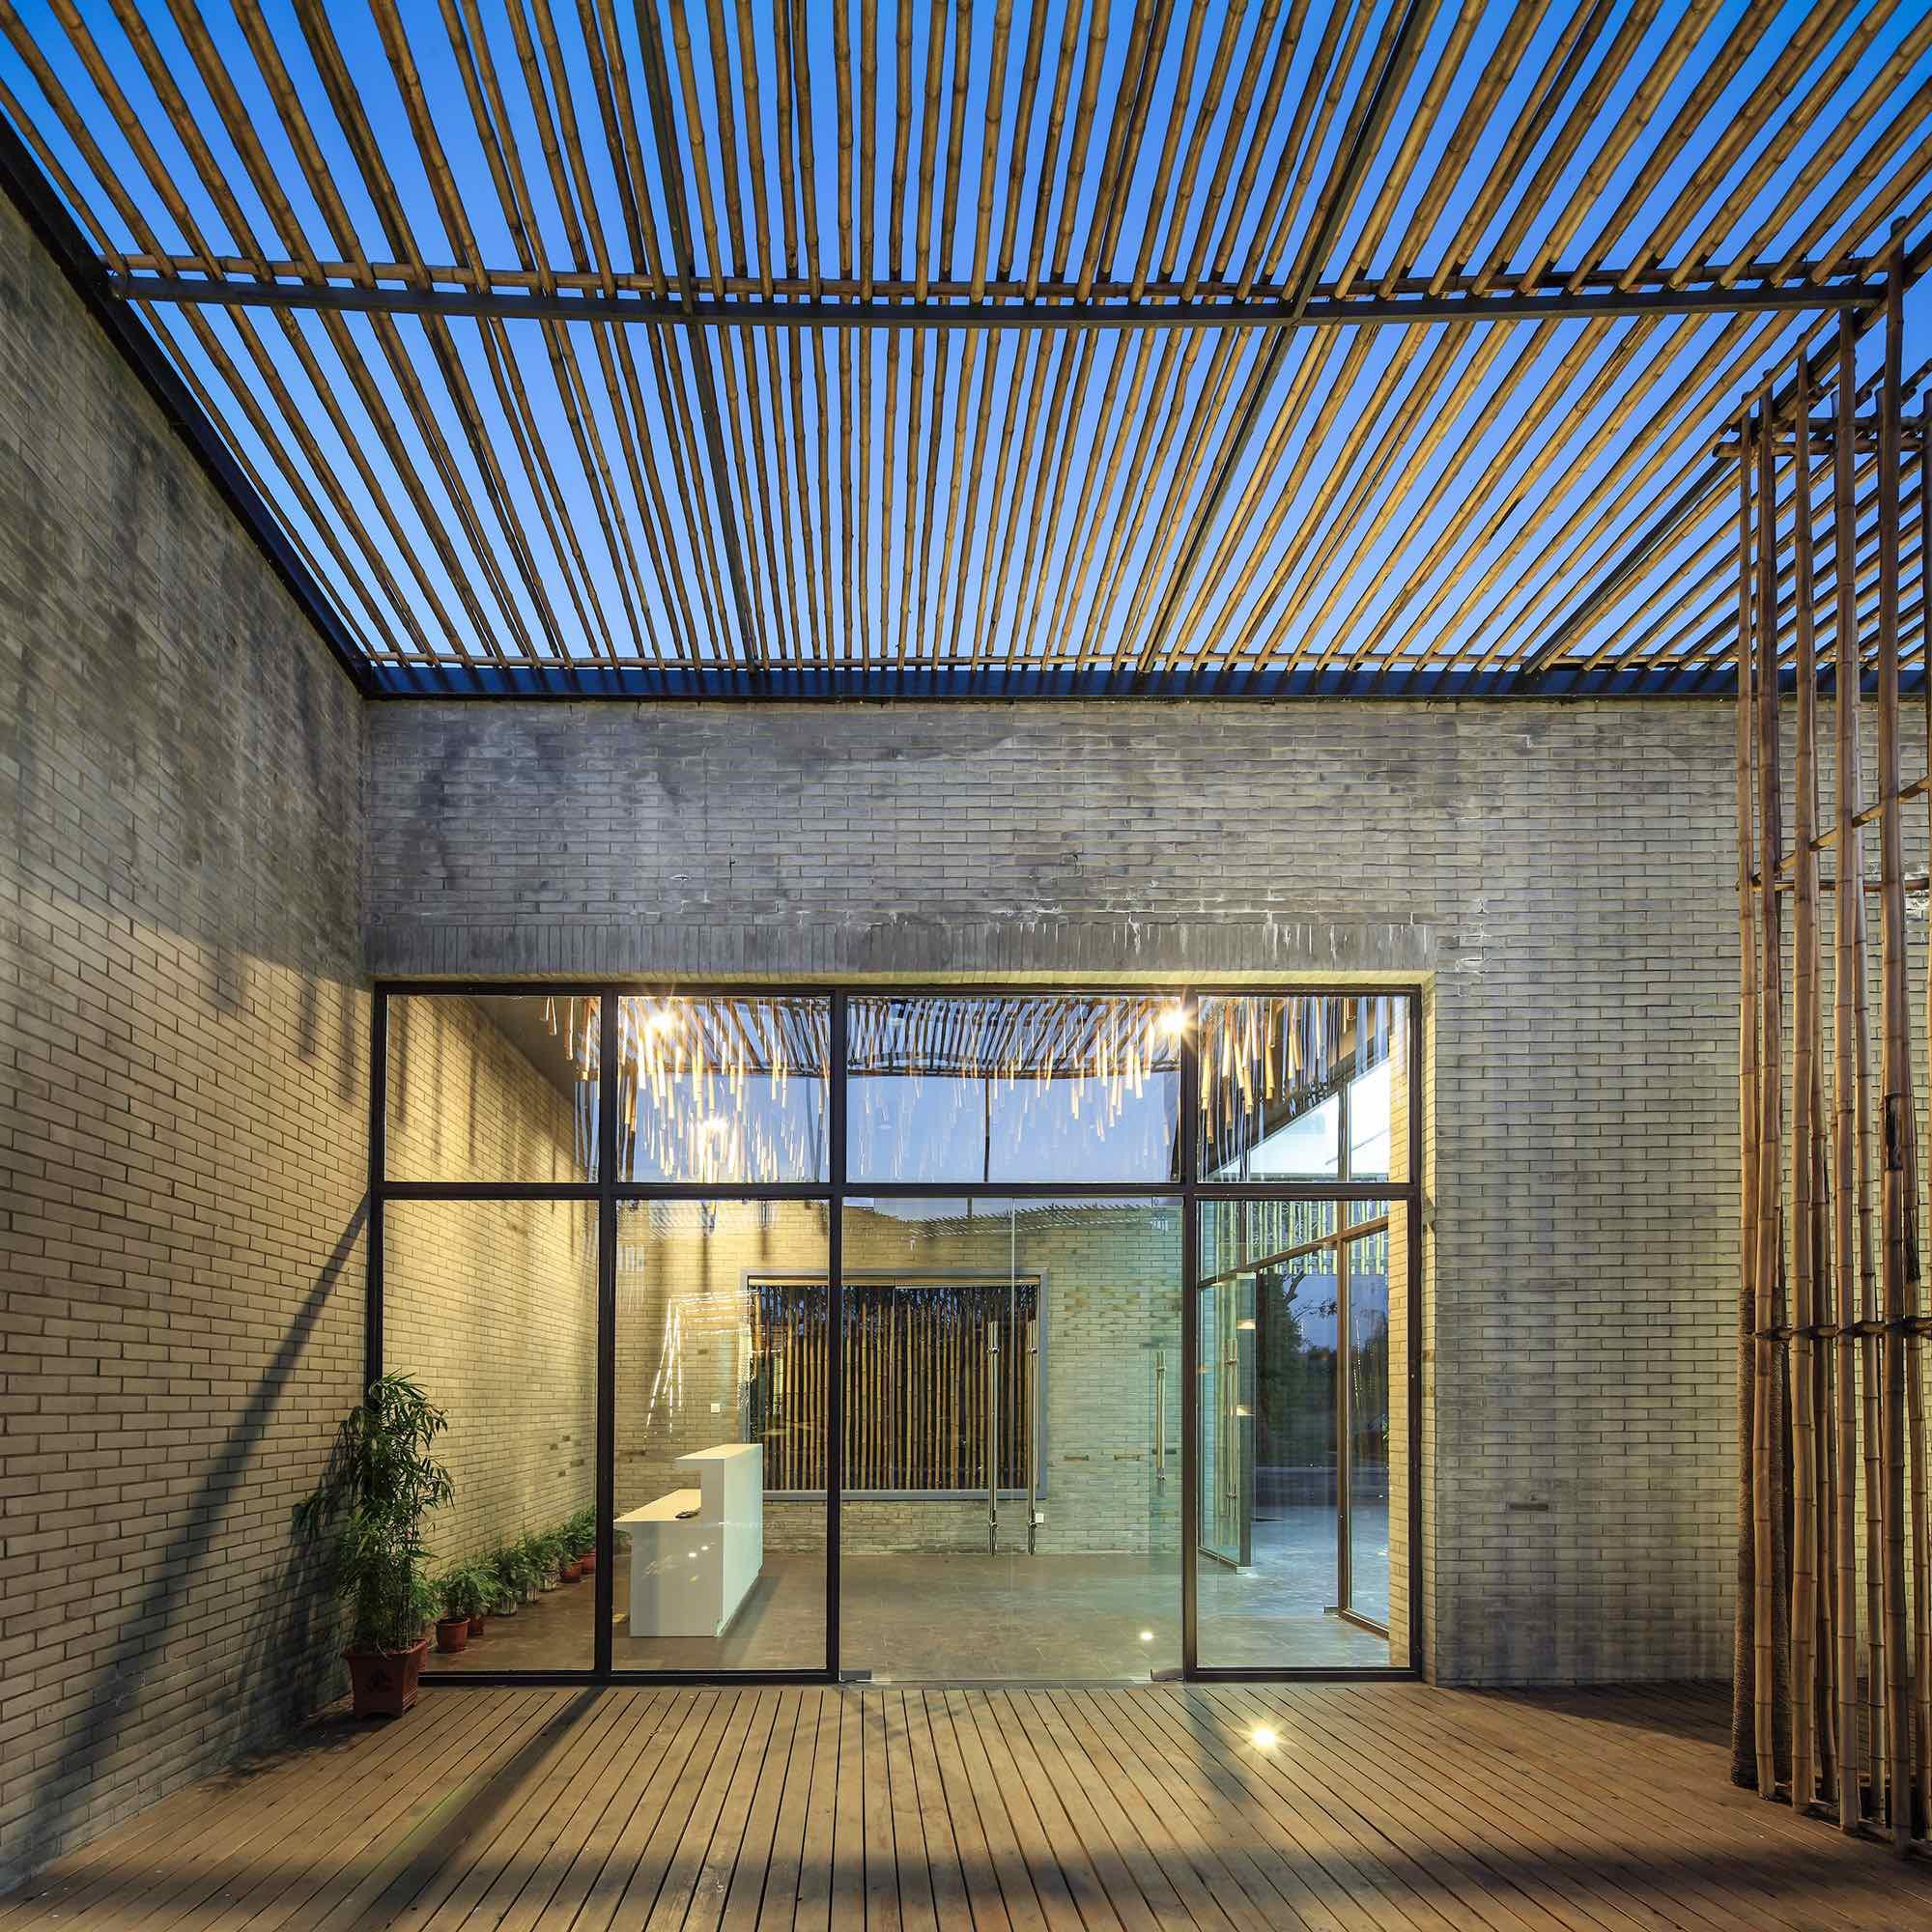 teahouse_11 reception area